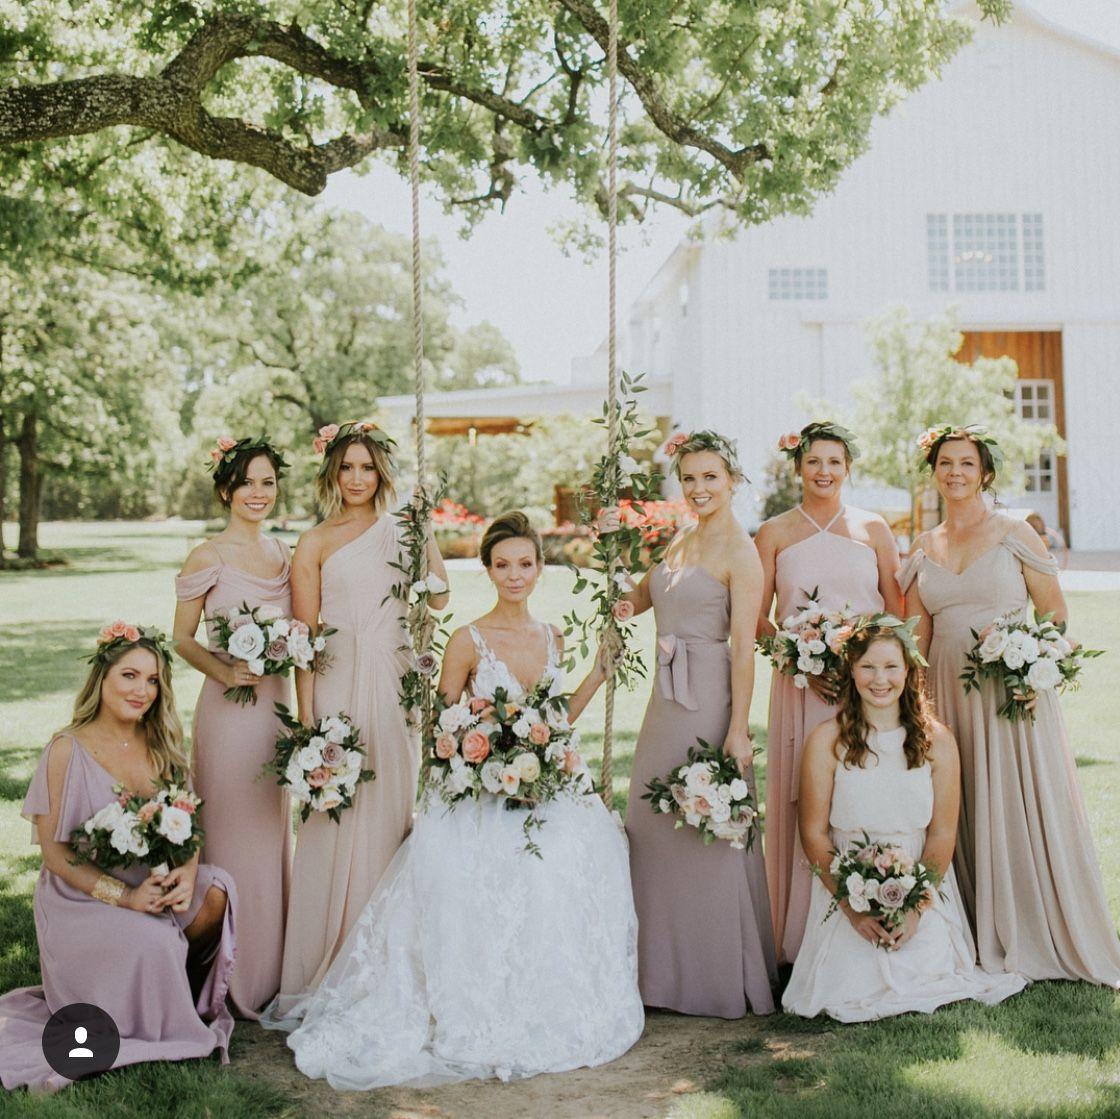 Ashley Tisdale Wedding Blush Dusty Rose Bridesmaids Flowers Taupe Stone Wedding Bridesmaid Bridal Couture